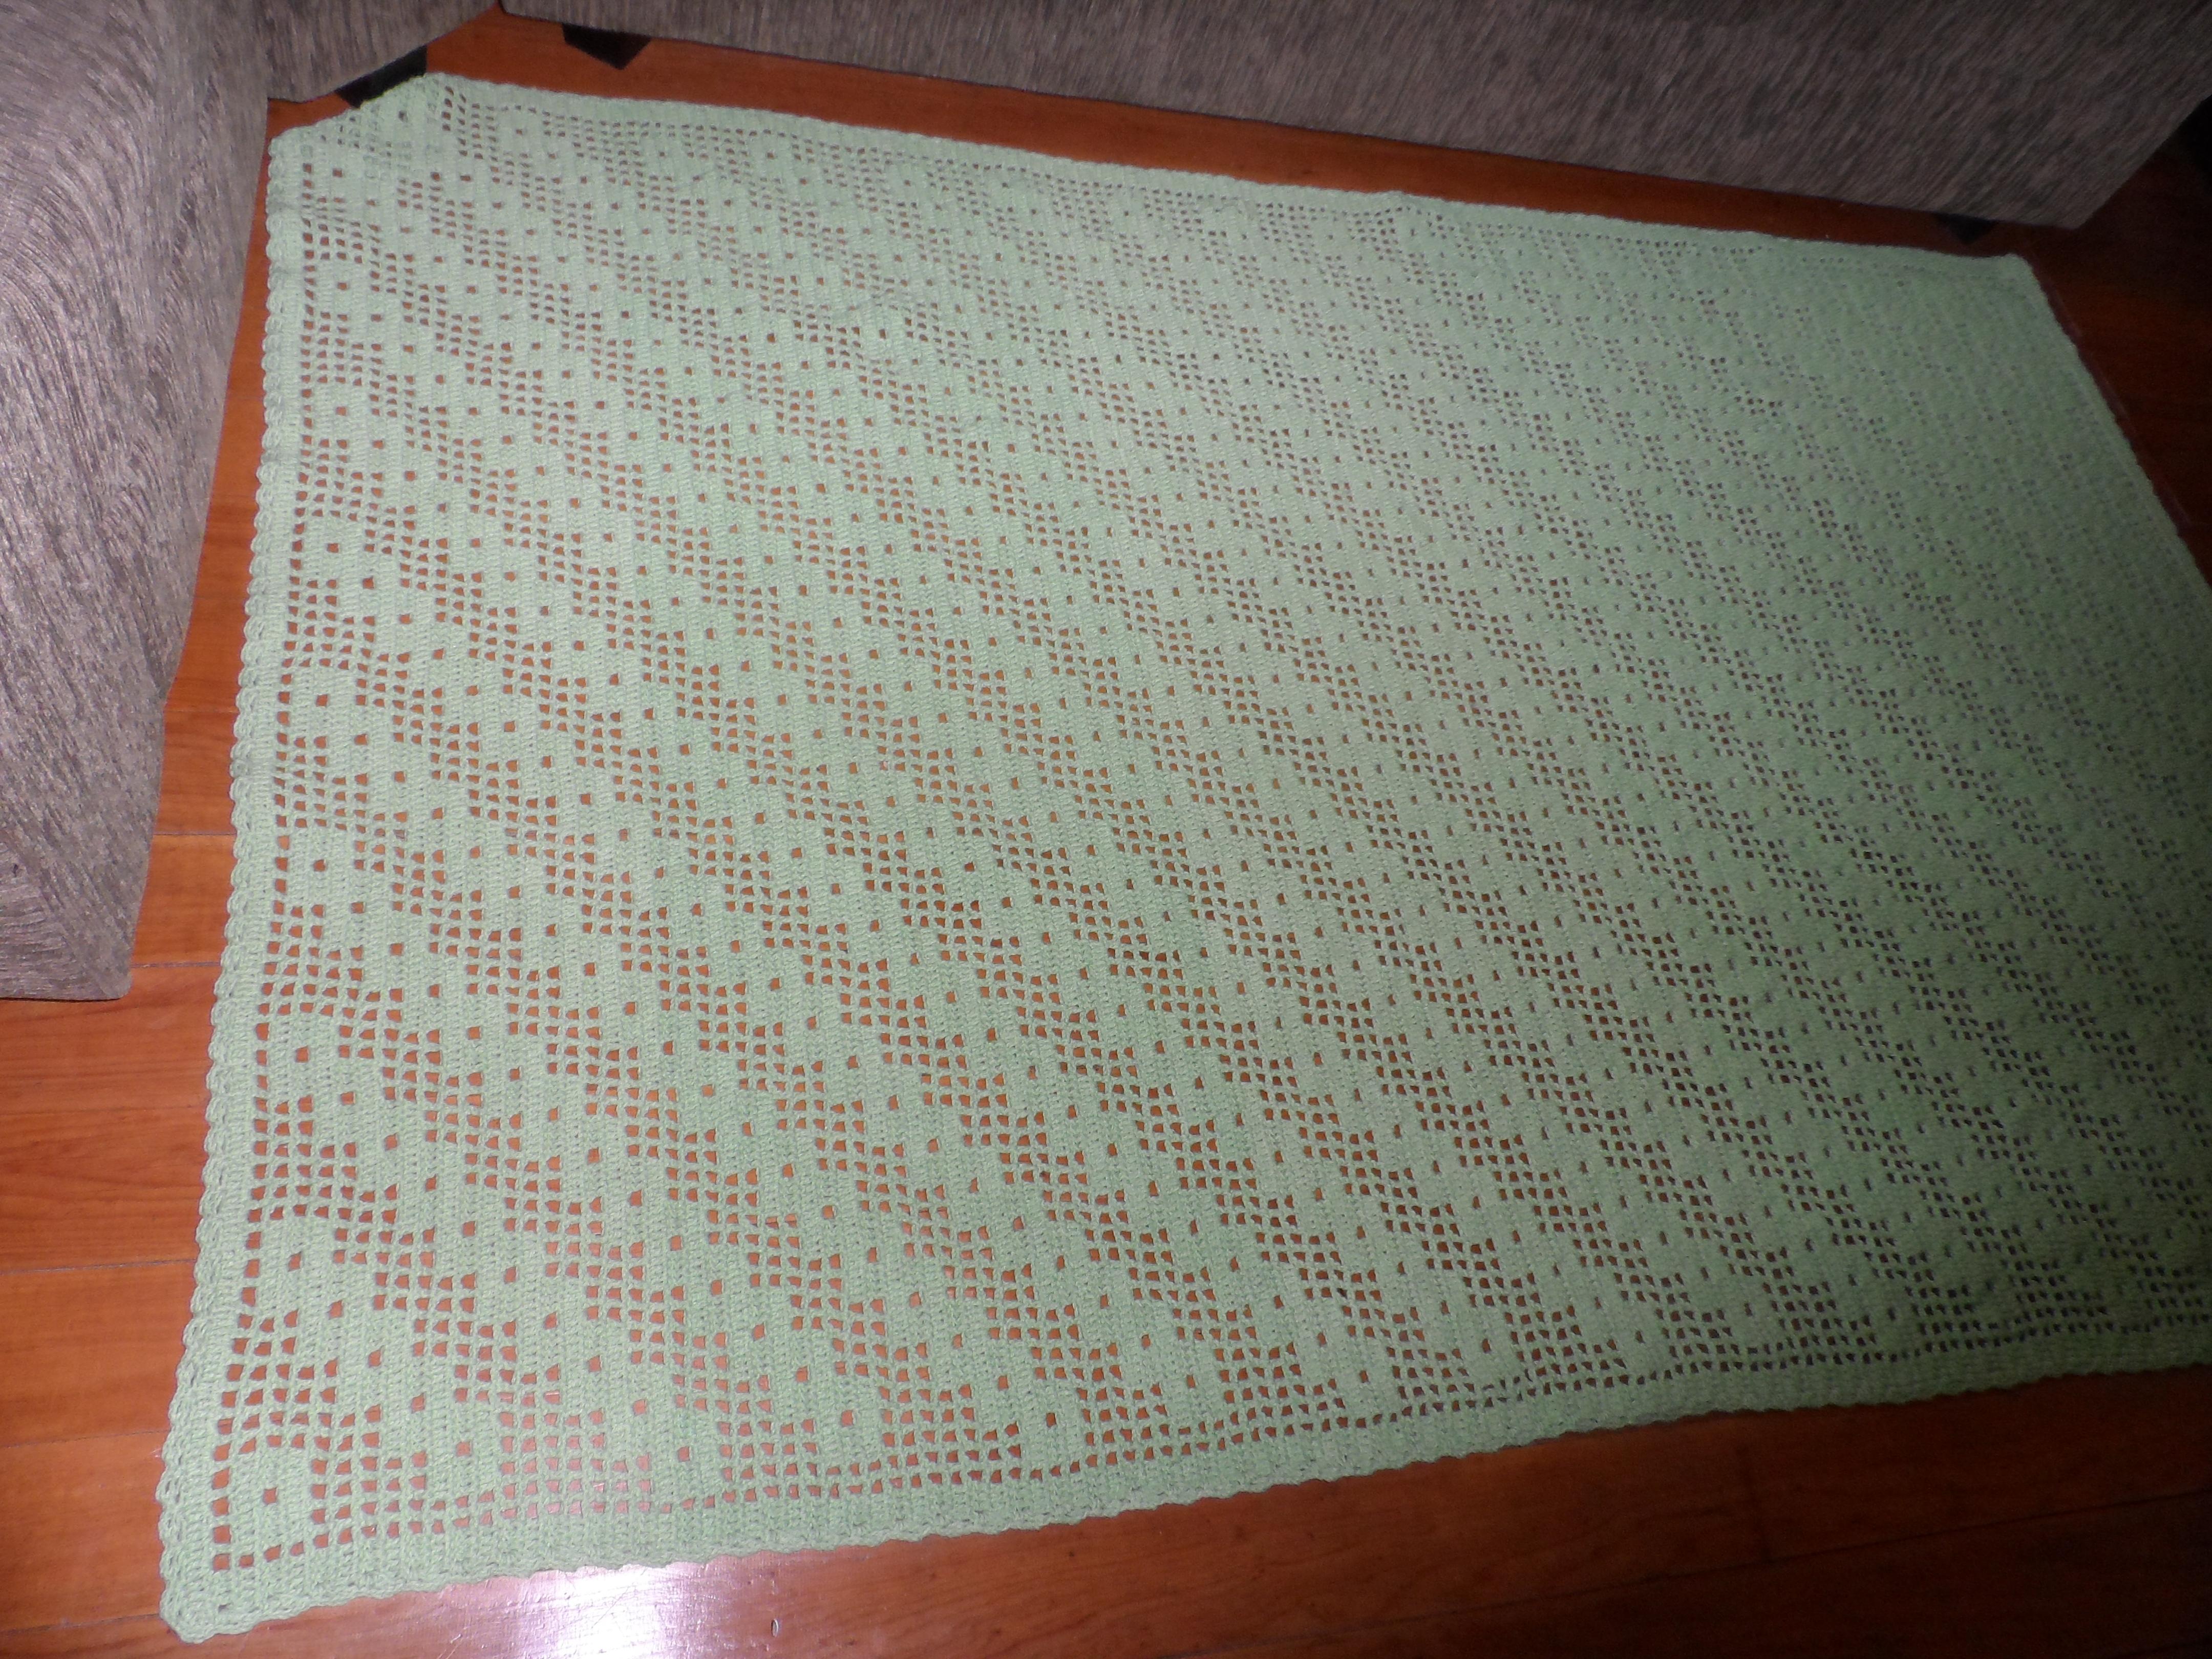 Tapete Croche Em Barbante Artes Da Cata -> Tapetes De Croche Para Sala